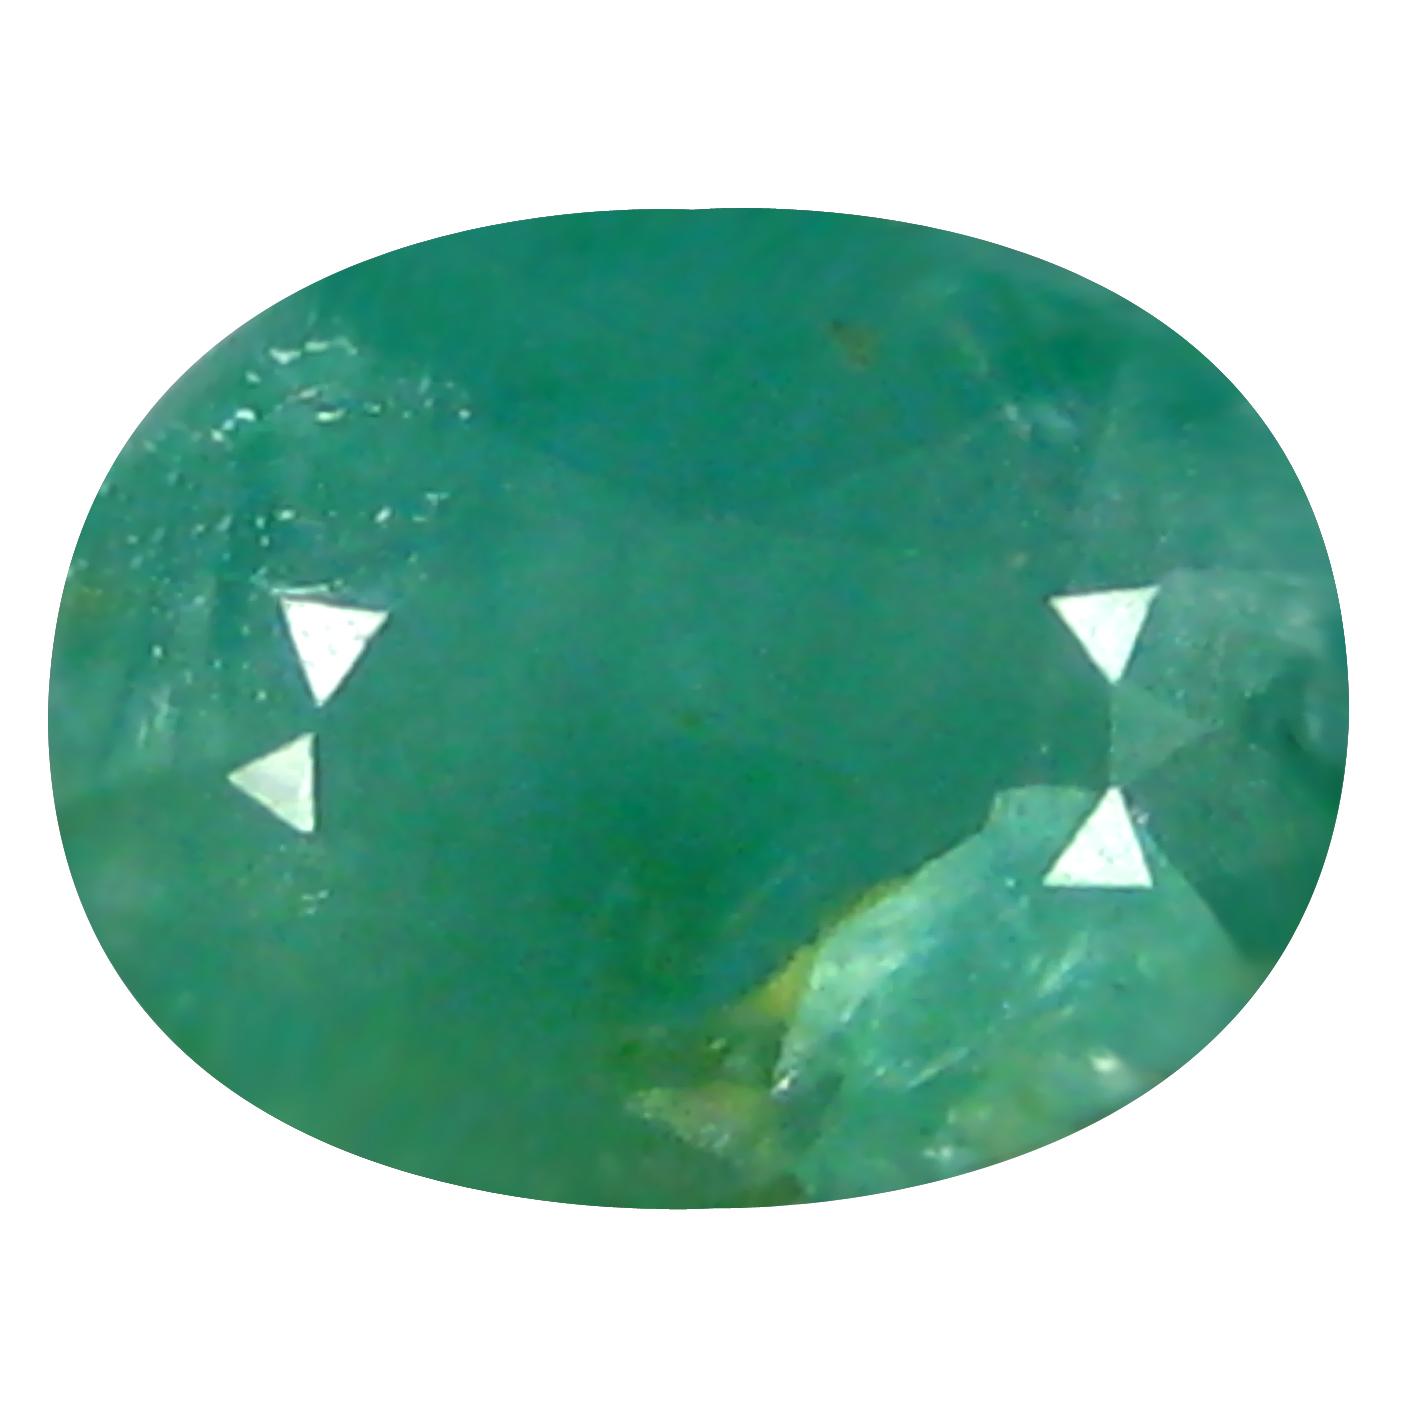 0.68 ct  Wonderful Oval Shape (7 x 5 mm) Bluish Green Grandidierite Natural Gemstone